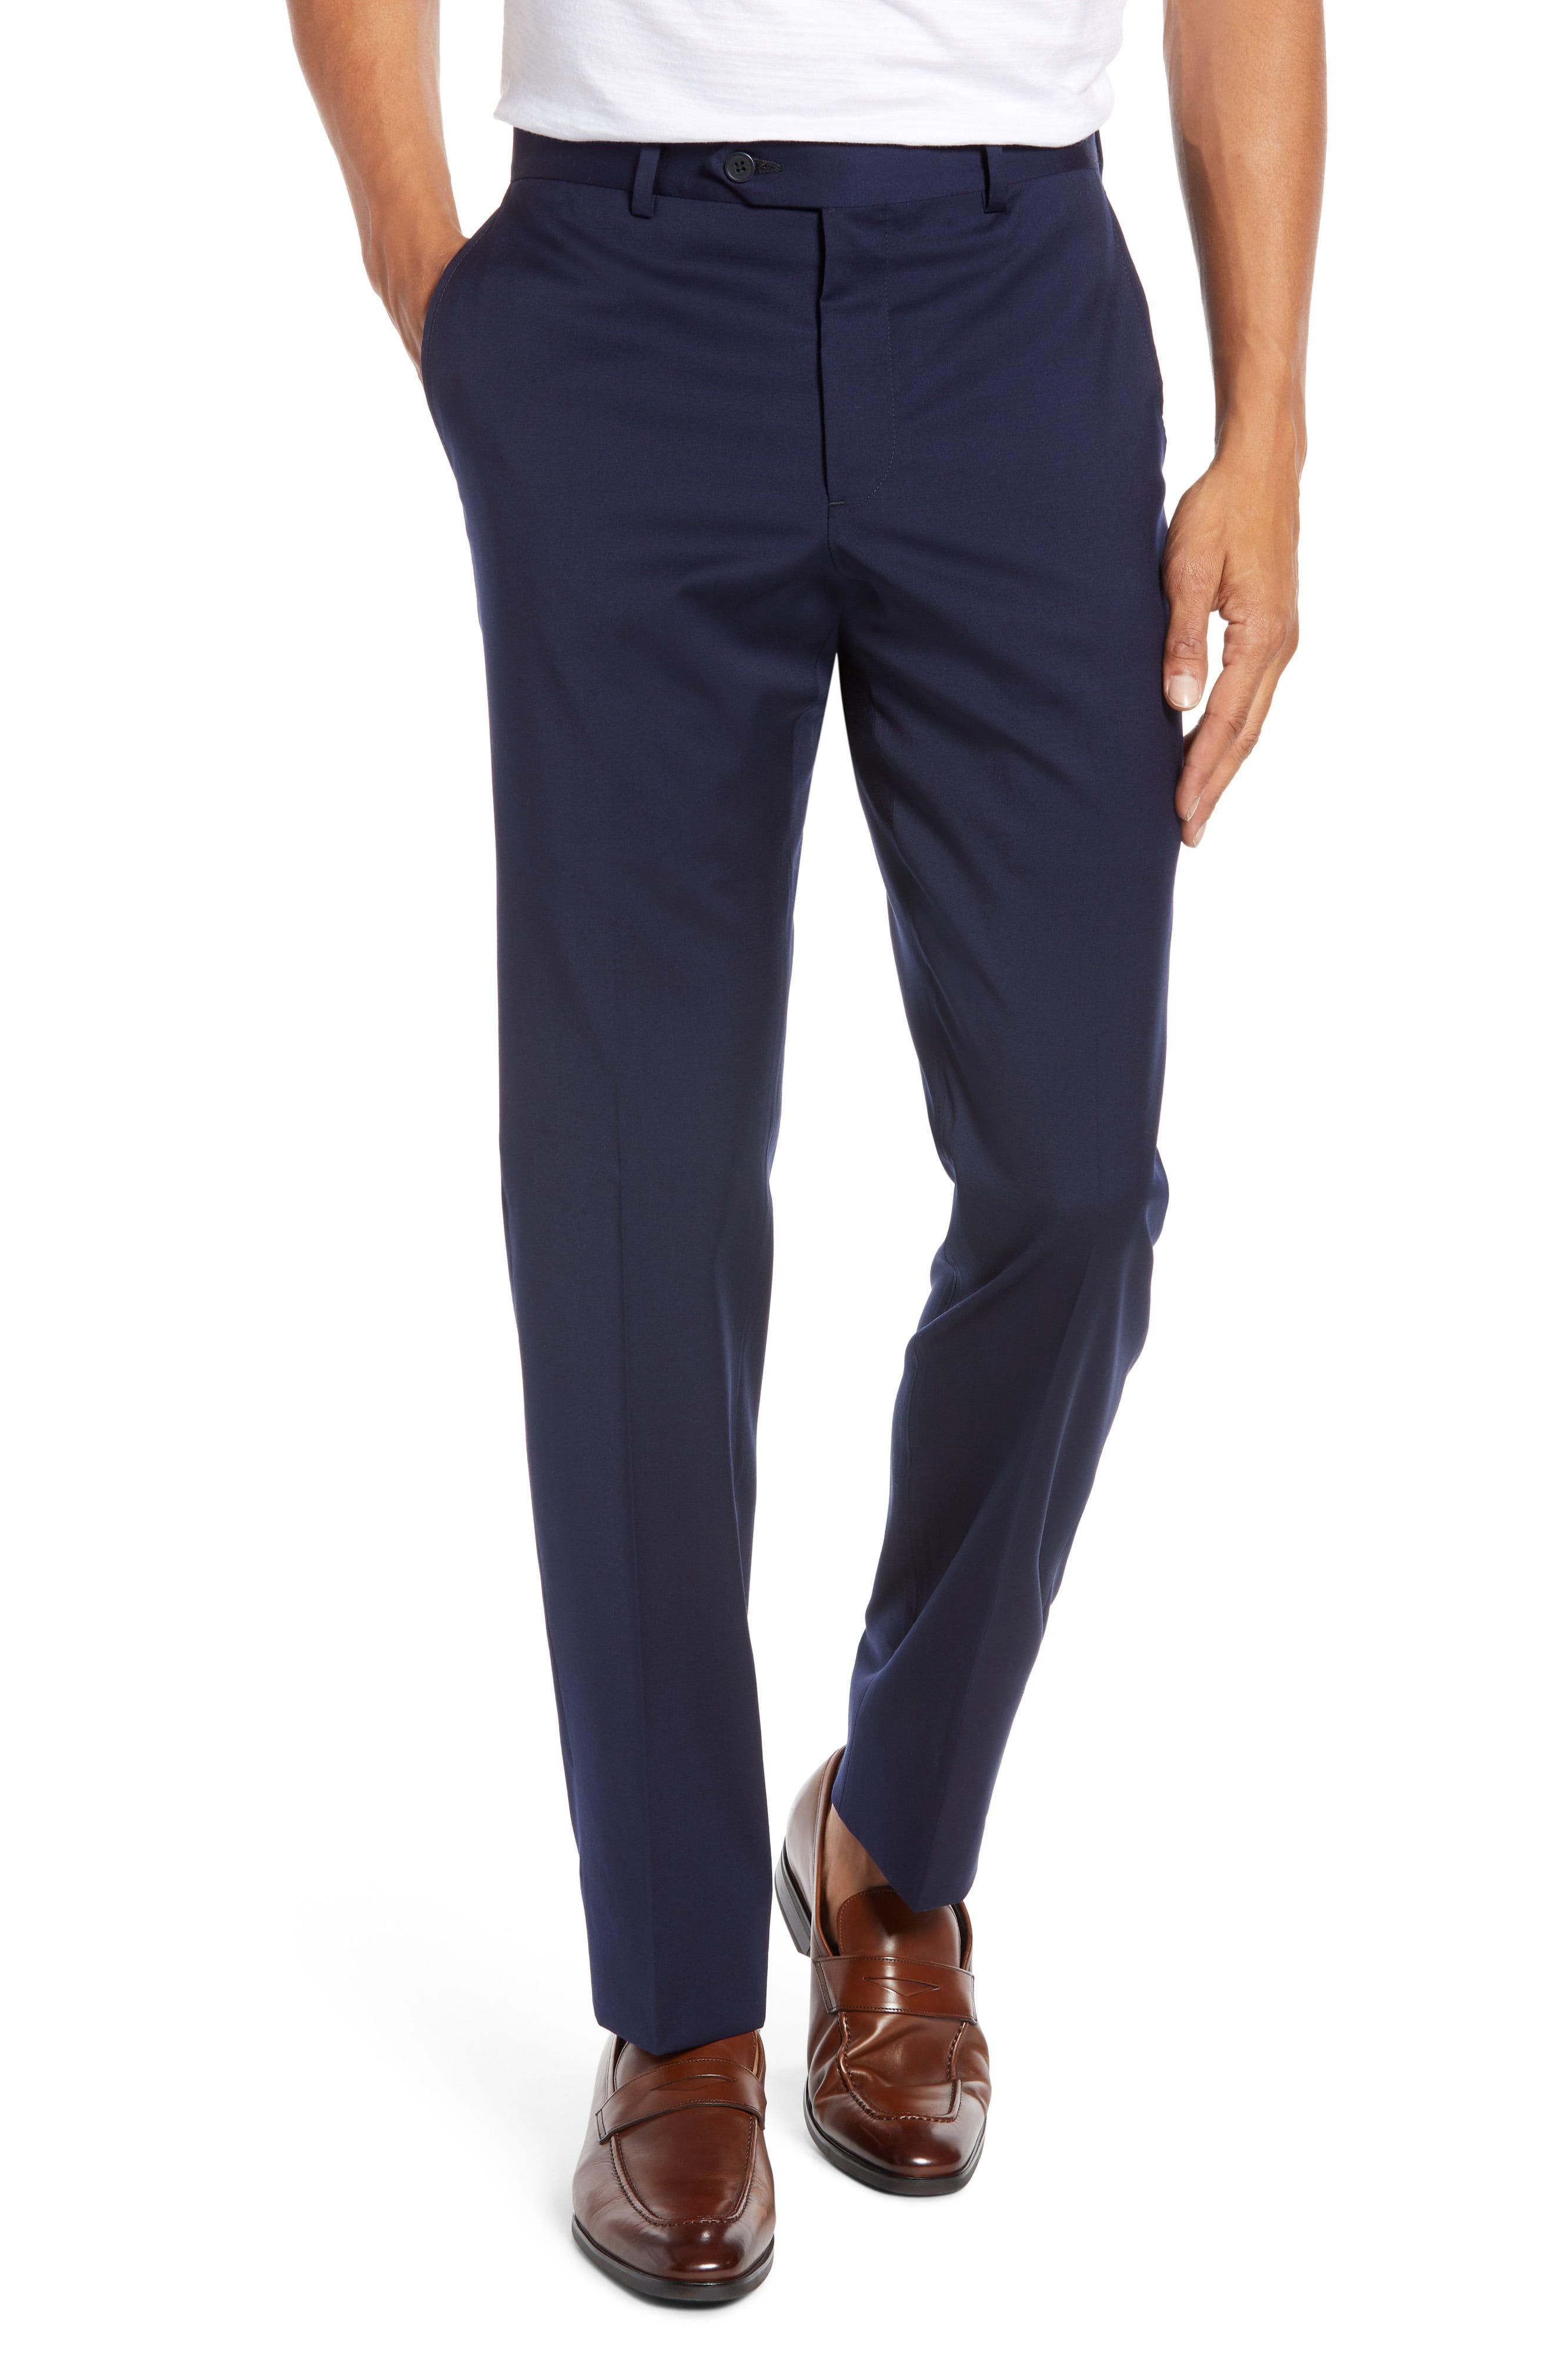 3679048deea3 Men's Nordstrom Men's Shop Trim Fit Stretch Wool Trousers, Size 38 x ...